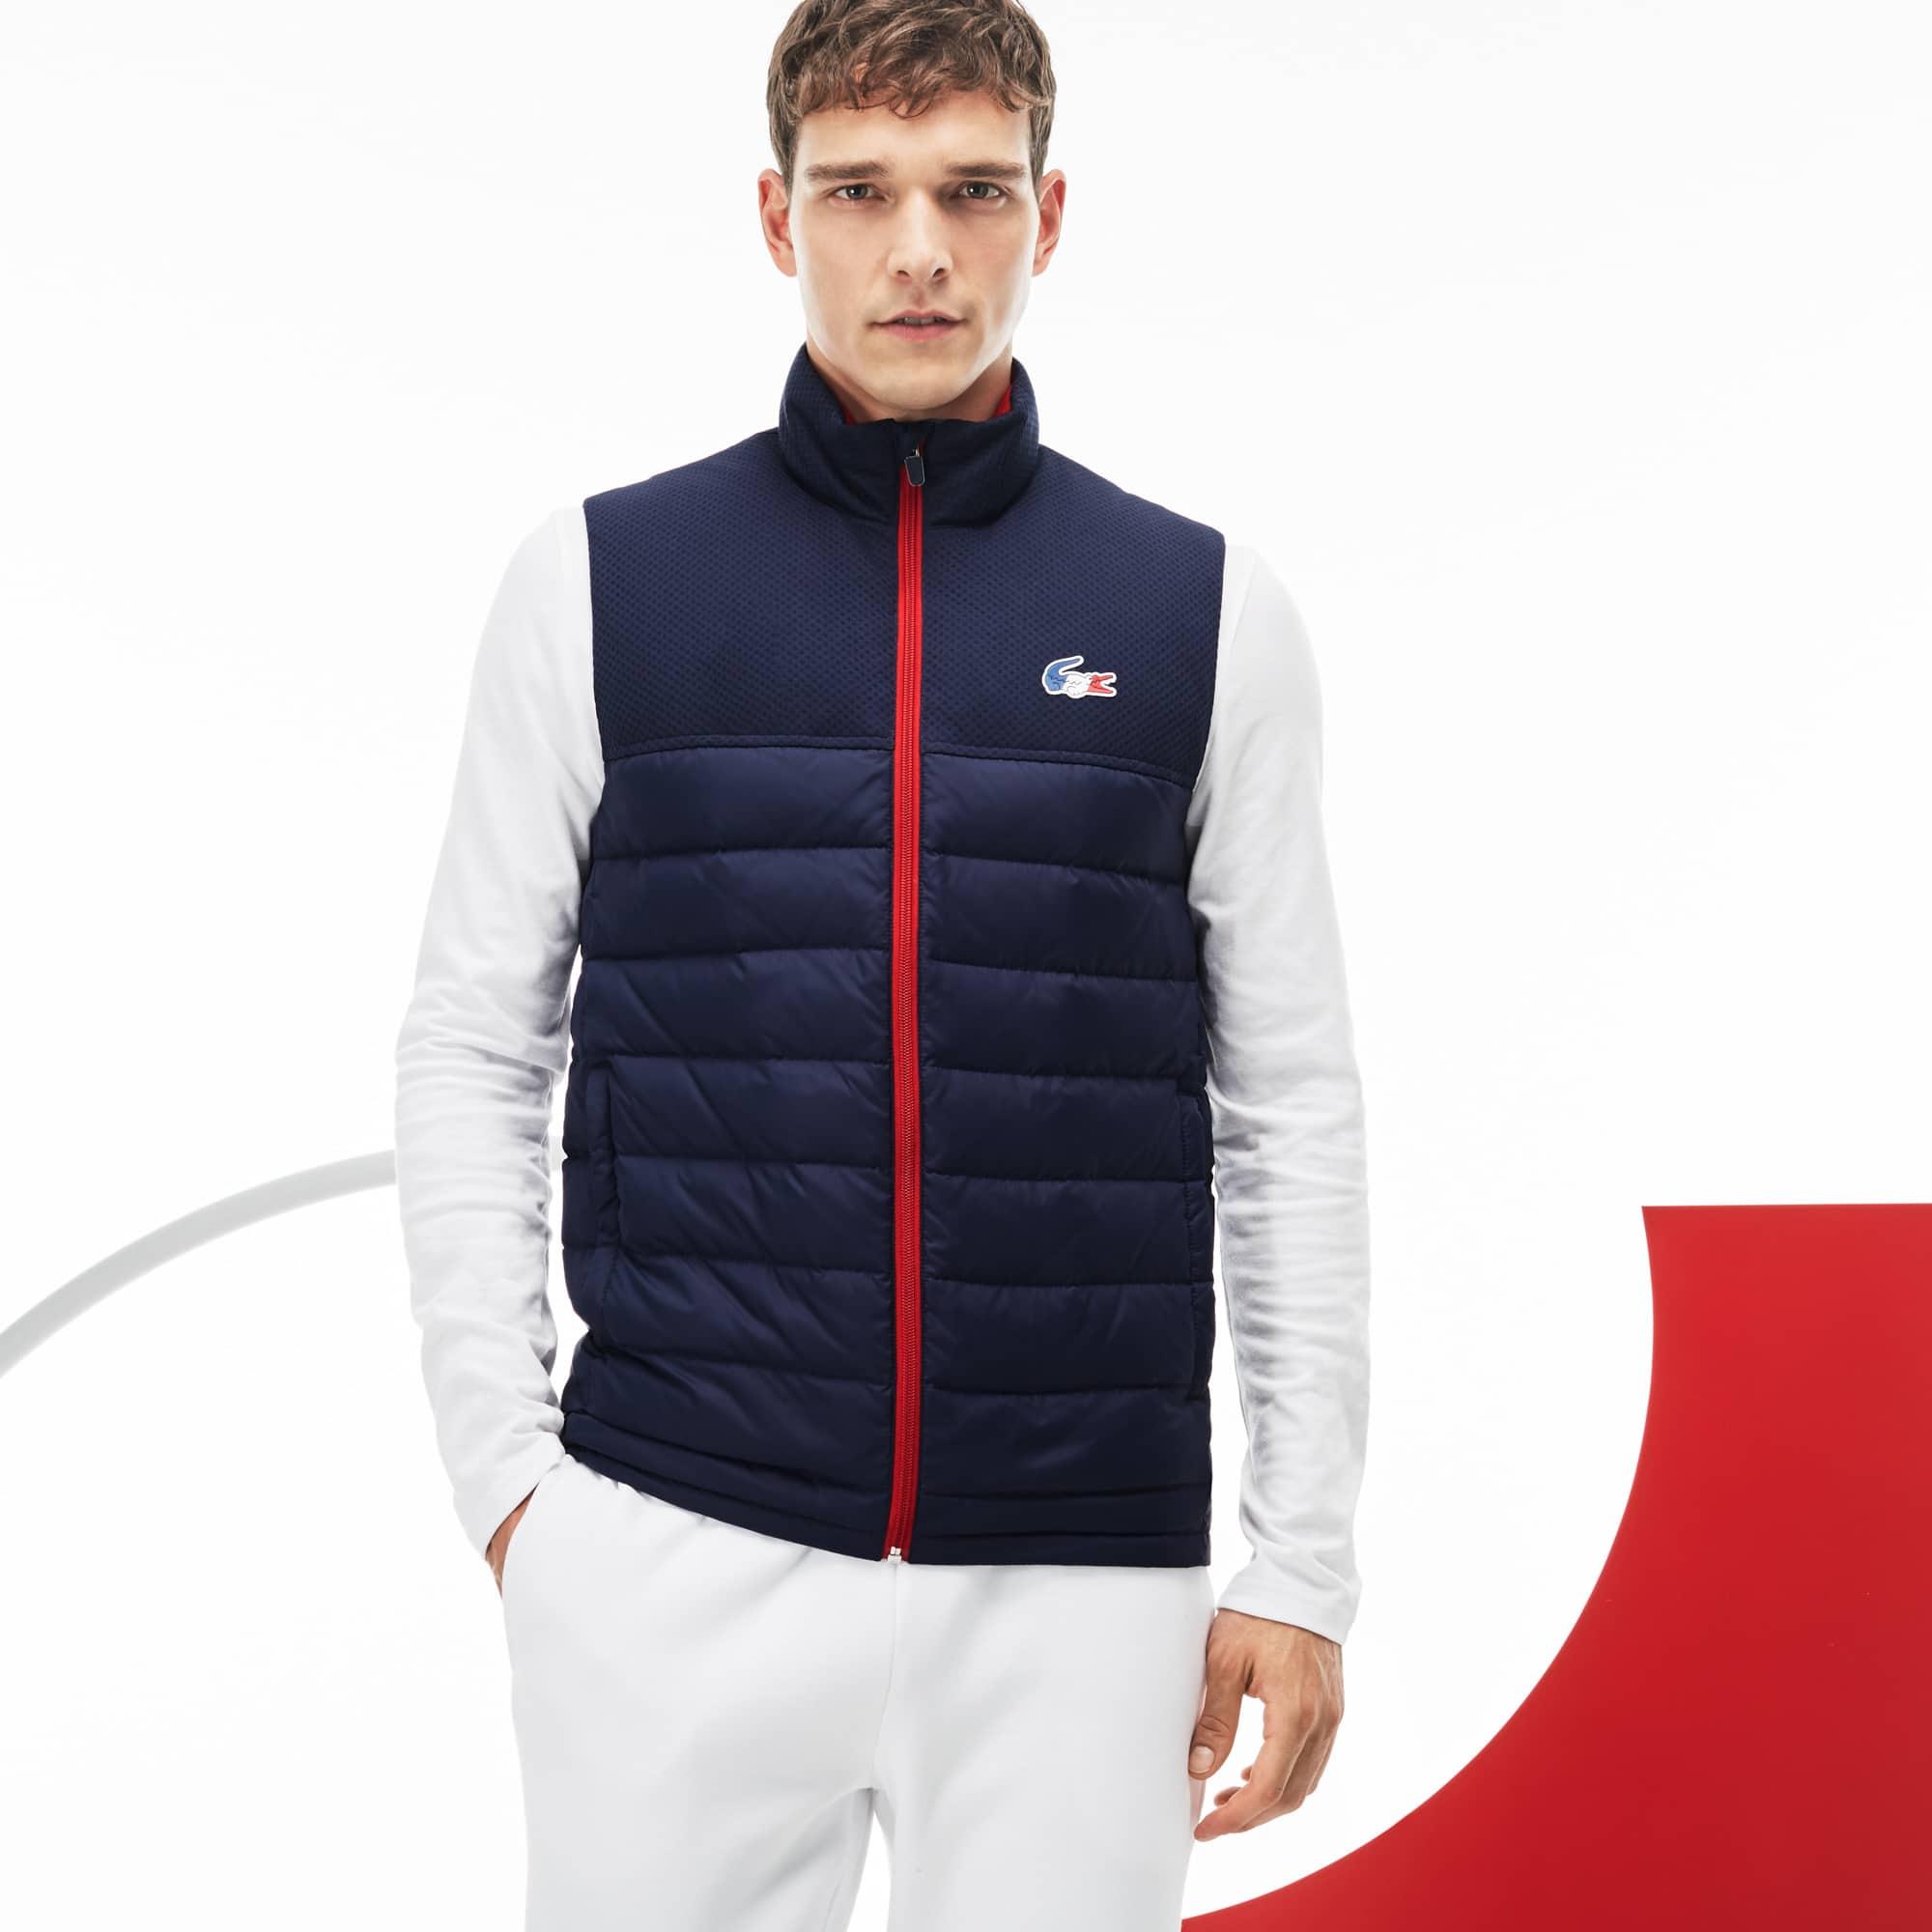 Men's Lacoste FRENCH SPORTING SPIRIT Edition Vest